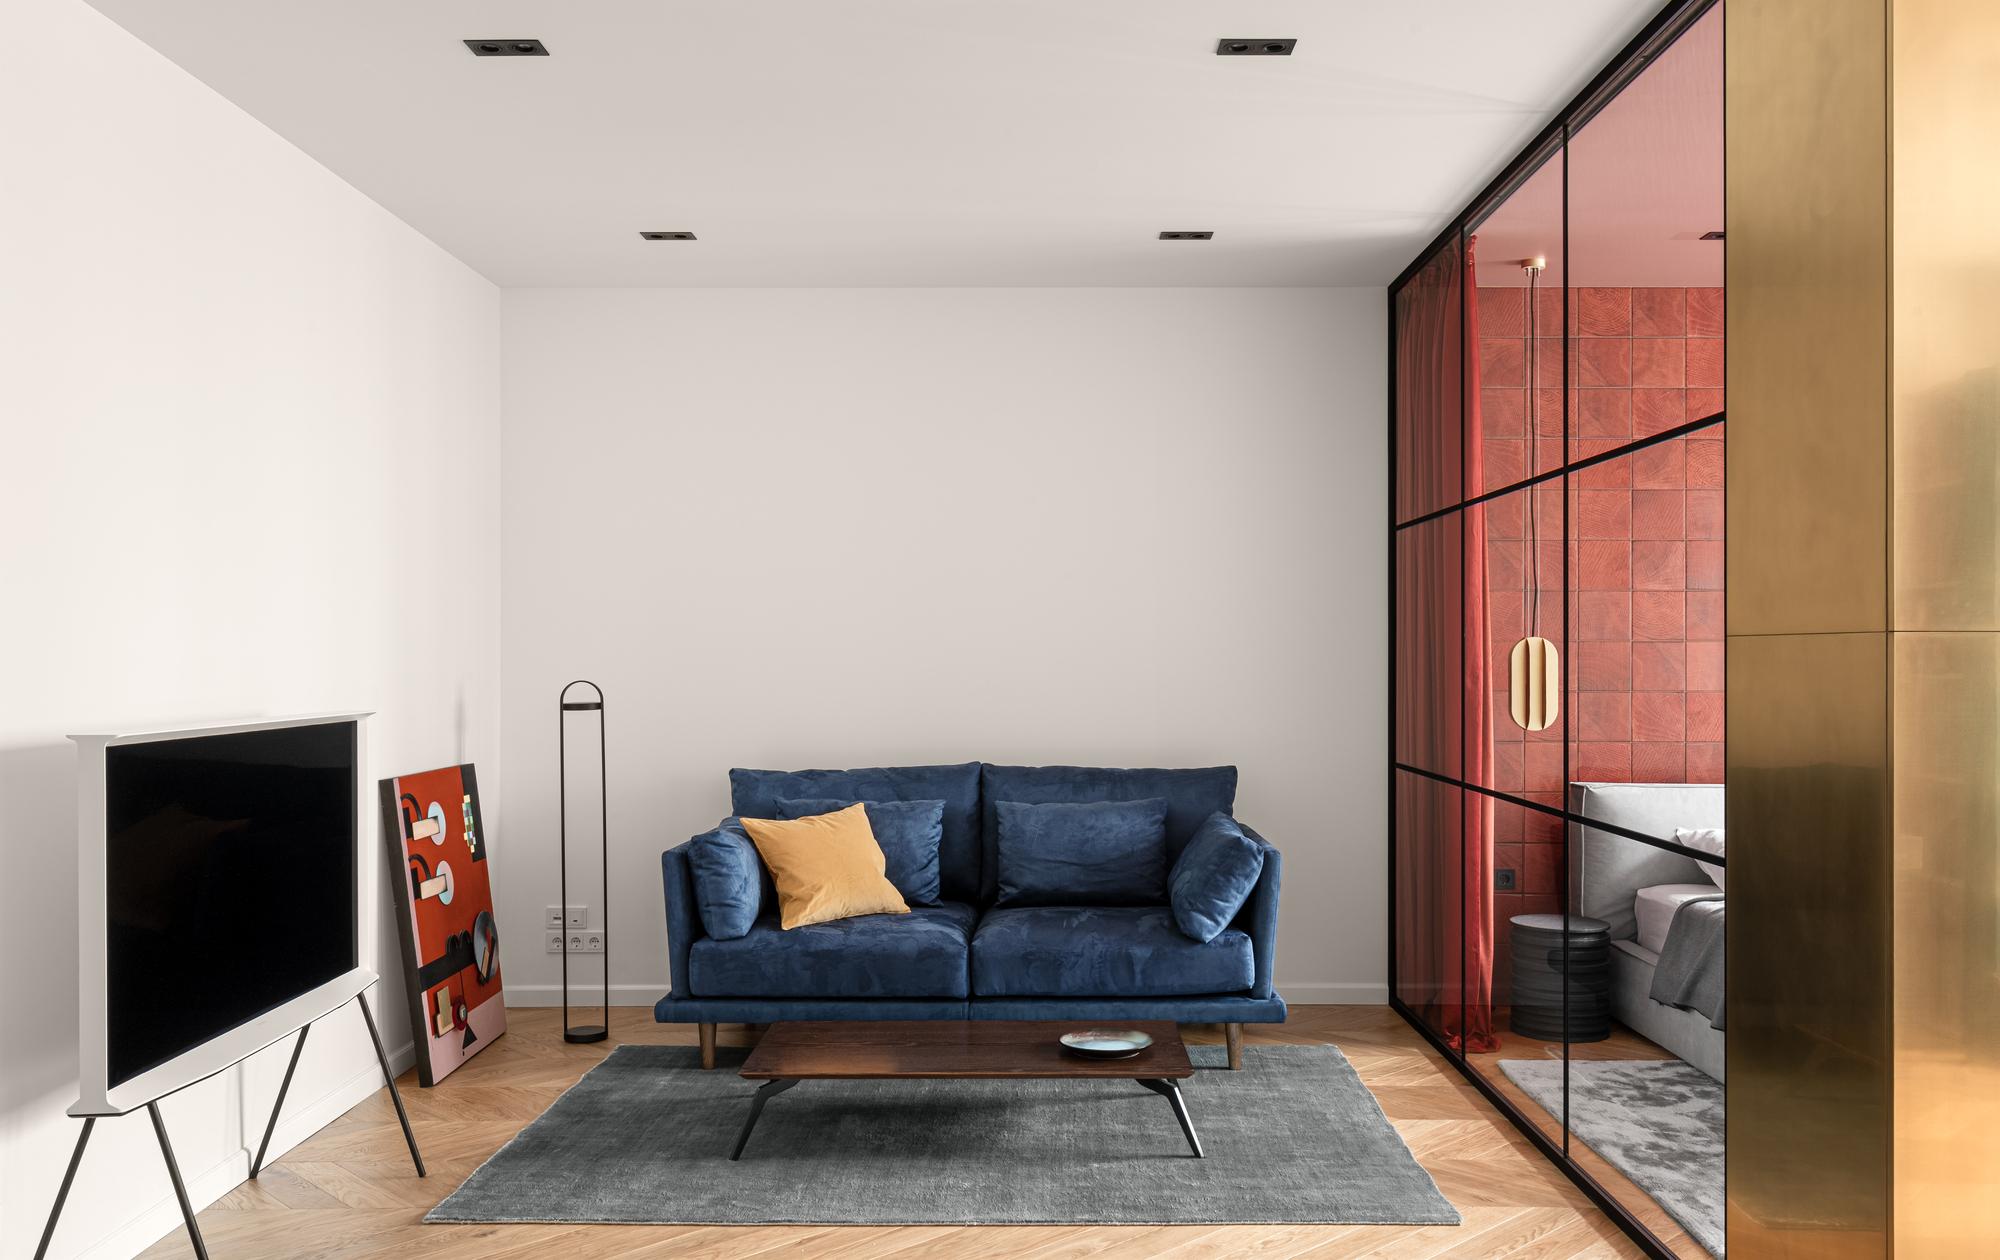 Mumbai Apartment / Nelly Prodan Design